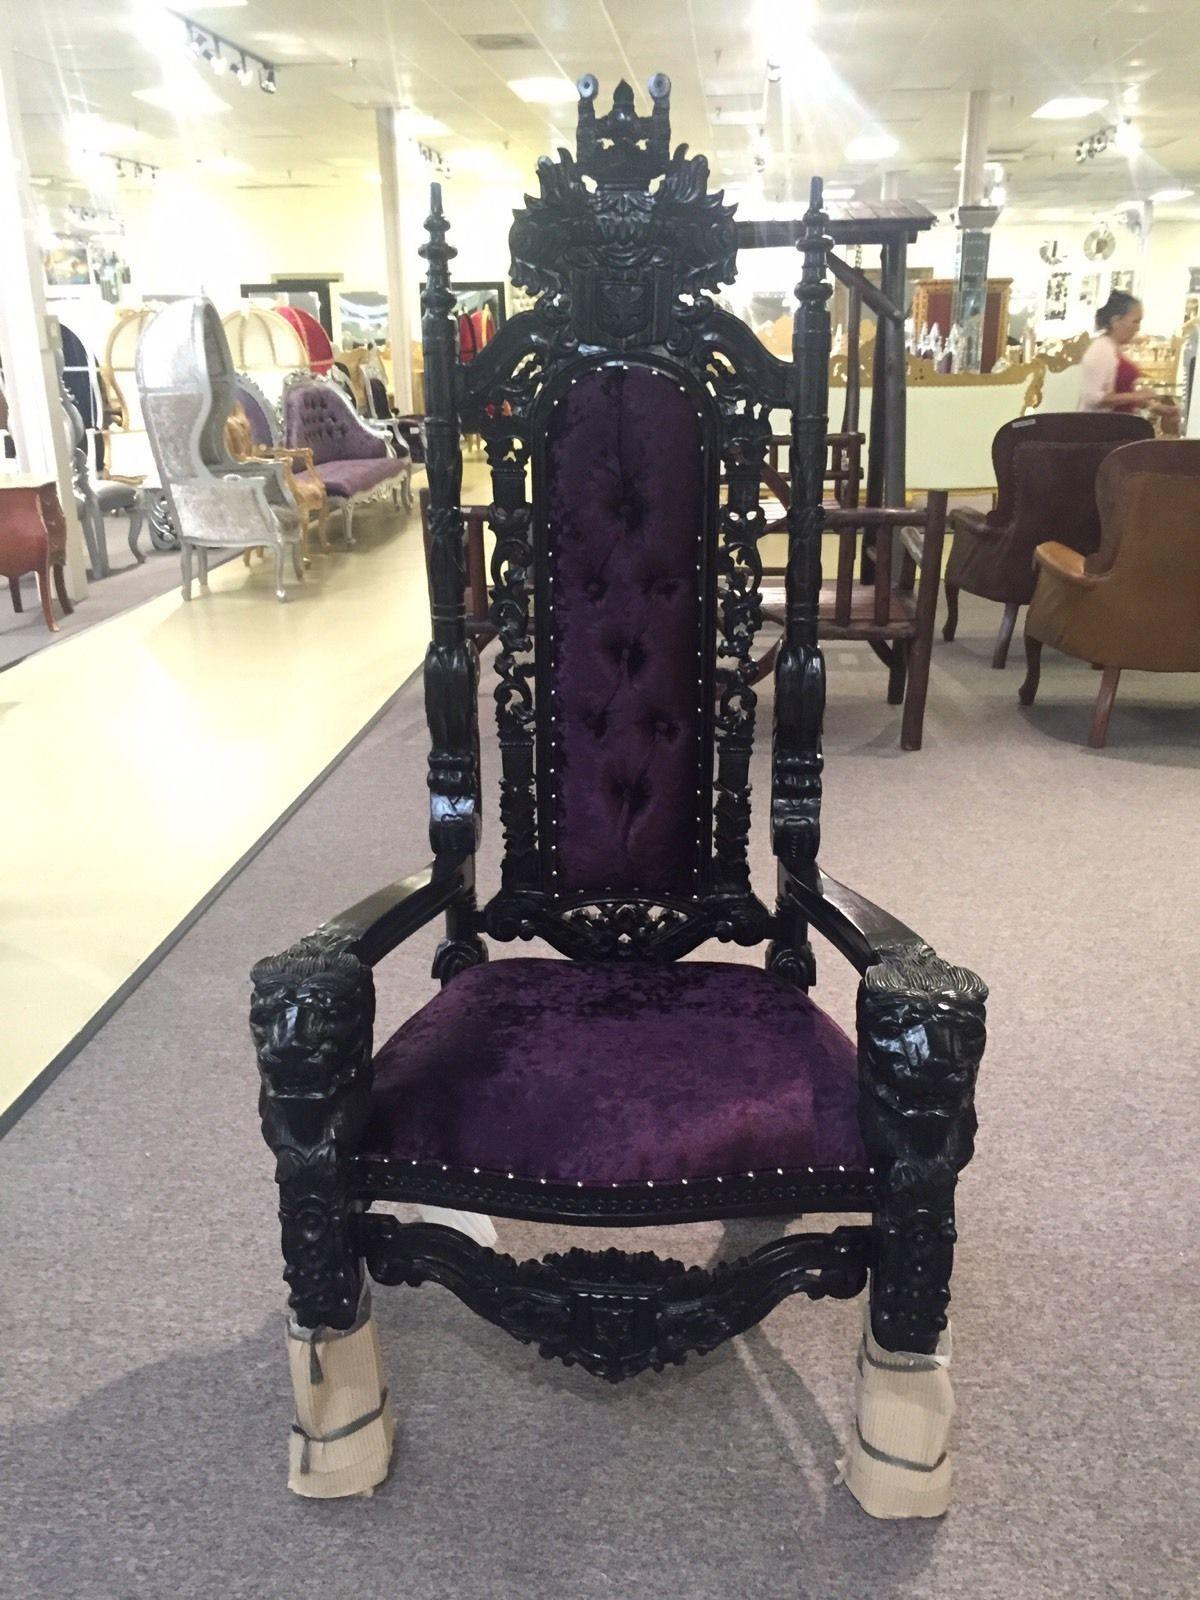 Black Lacquer Amp Purple Velvet Lord Raffles Throne Chair